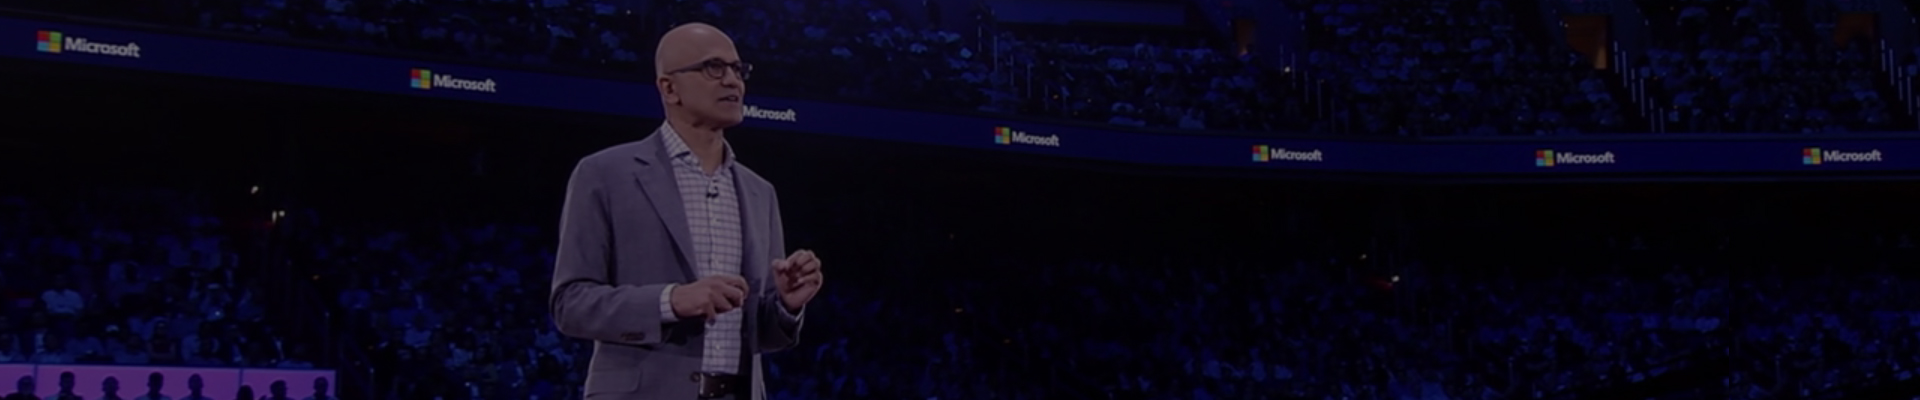 Jetzt ansehen: Satya Nadella kündigt Microsoft 365 an